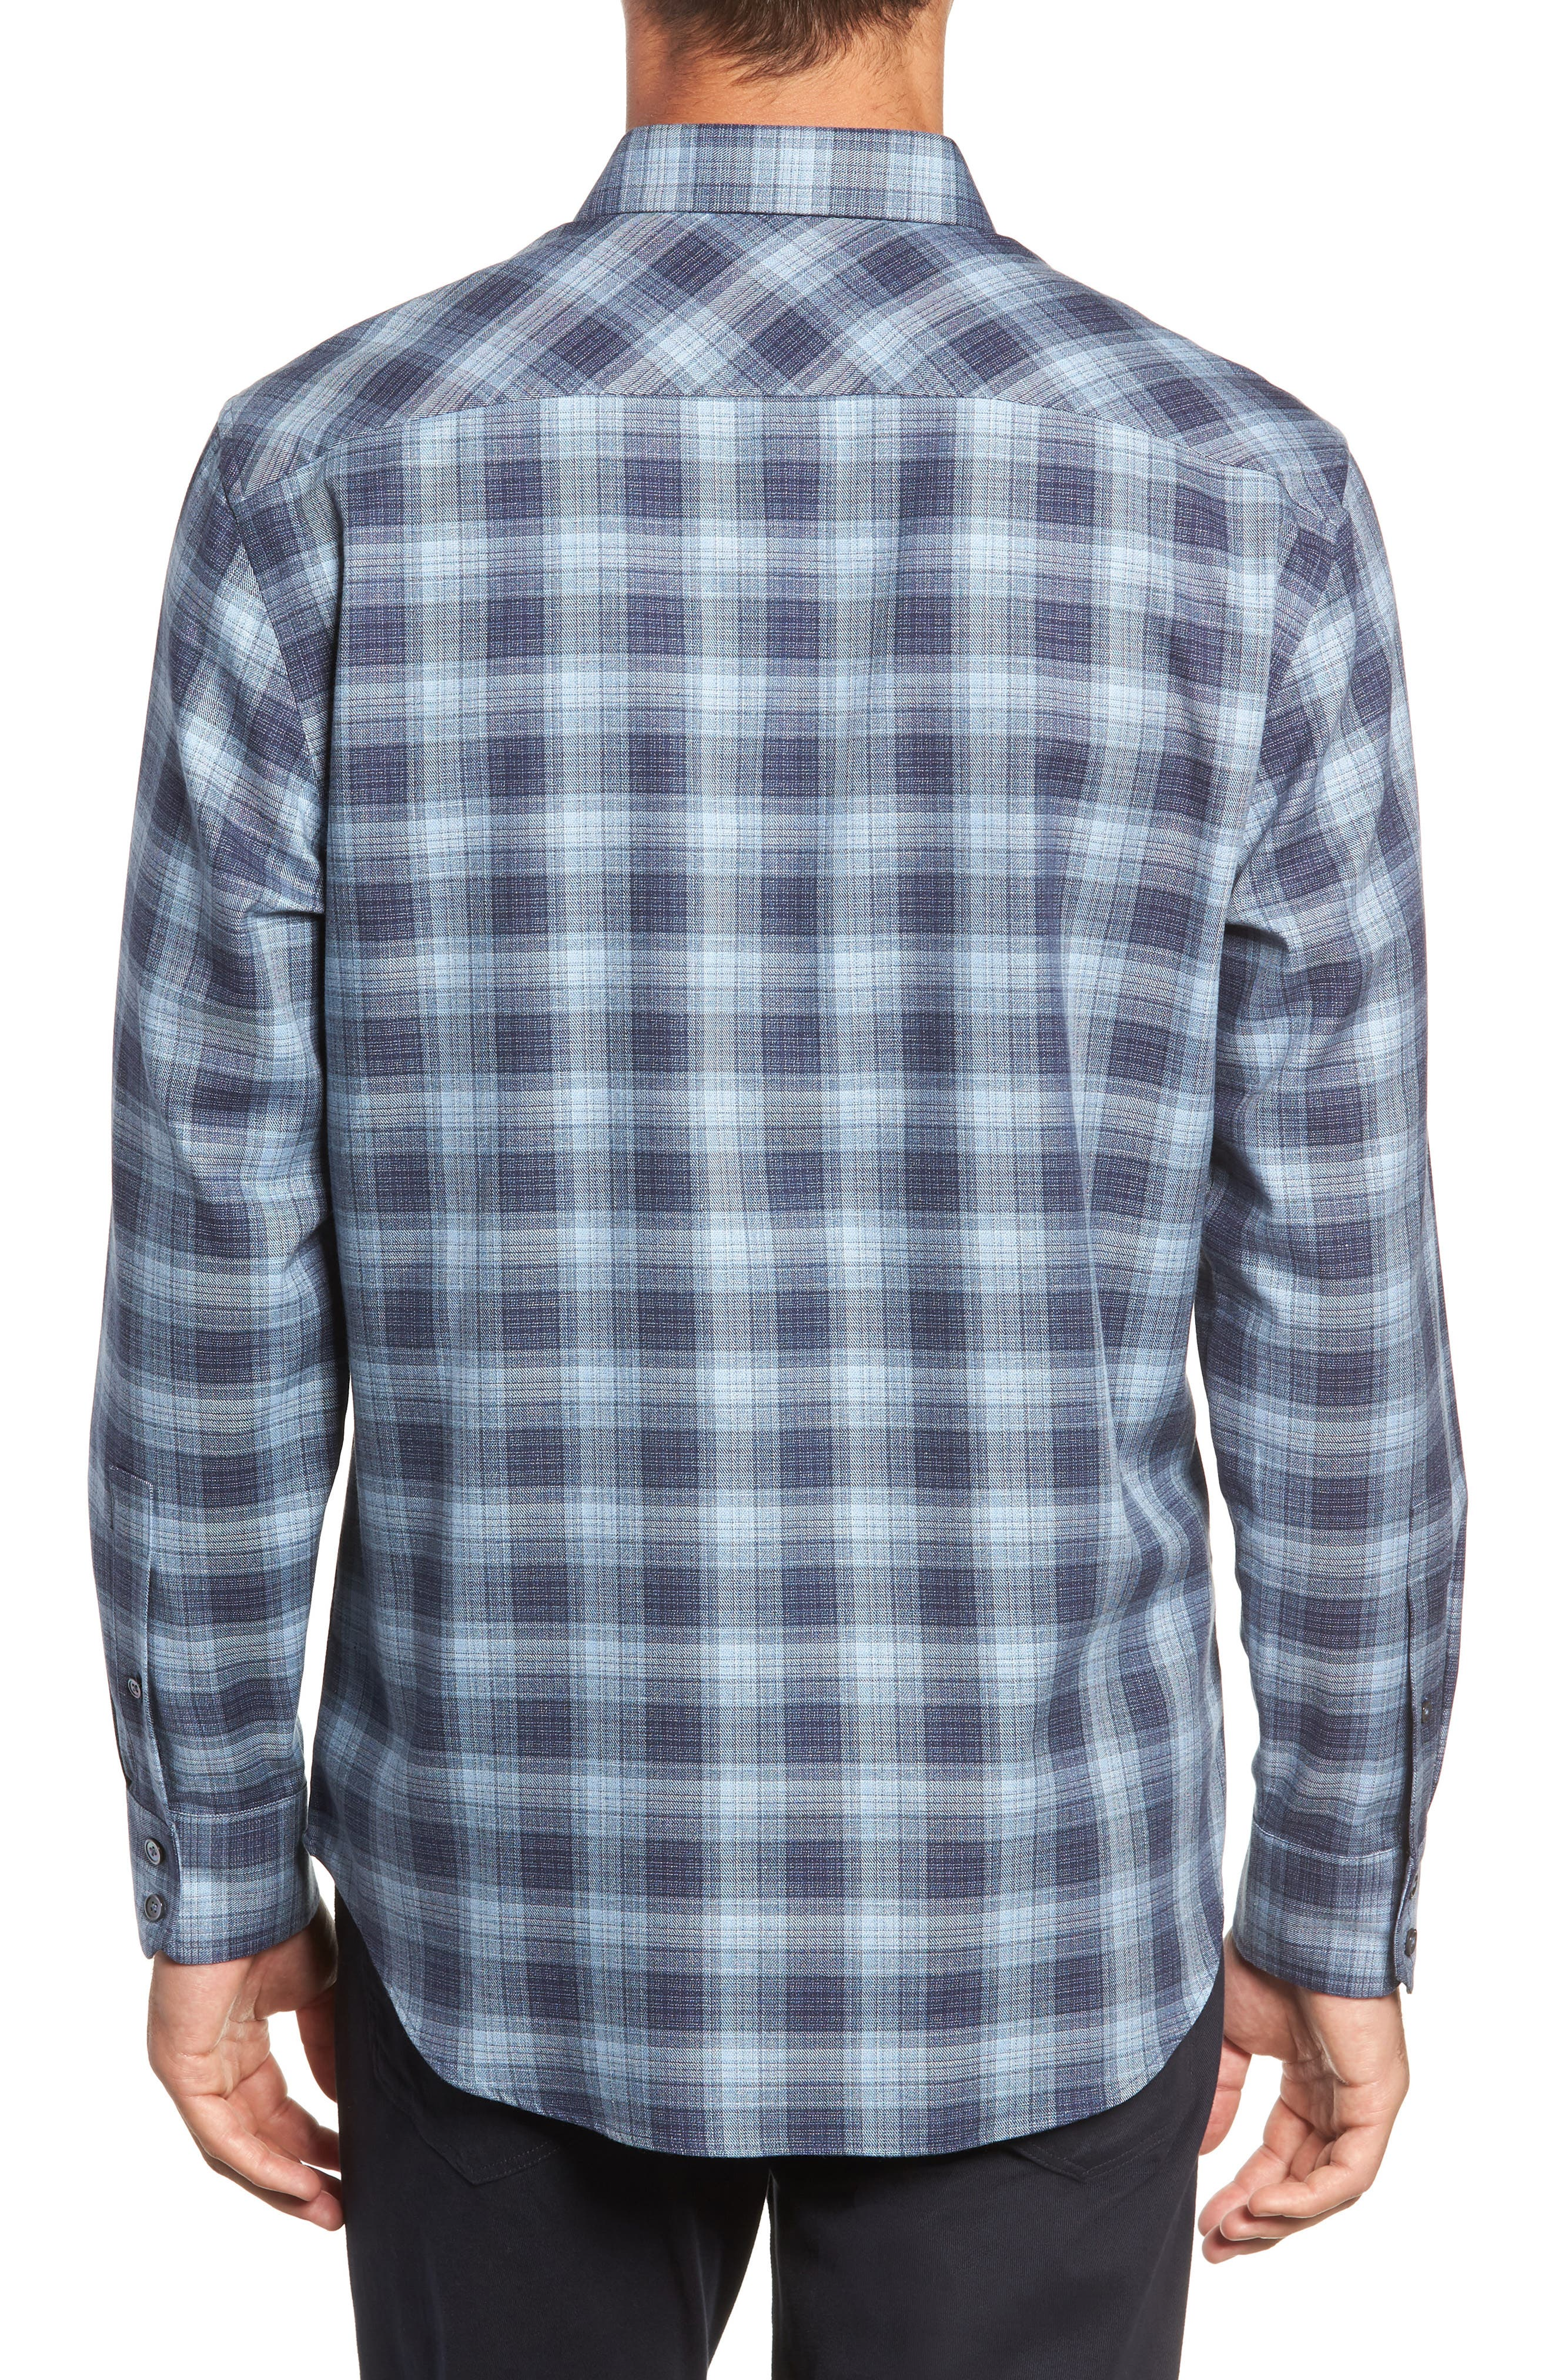 Oris Regular Fit Check Sport Shirt,                             Alternate thumbnail 3, color,                             BLUE